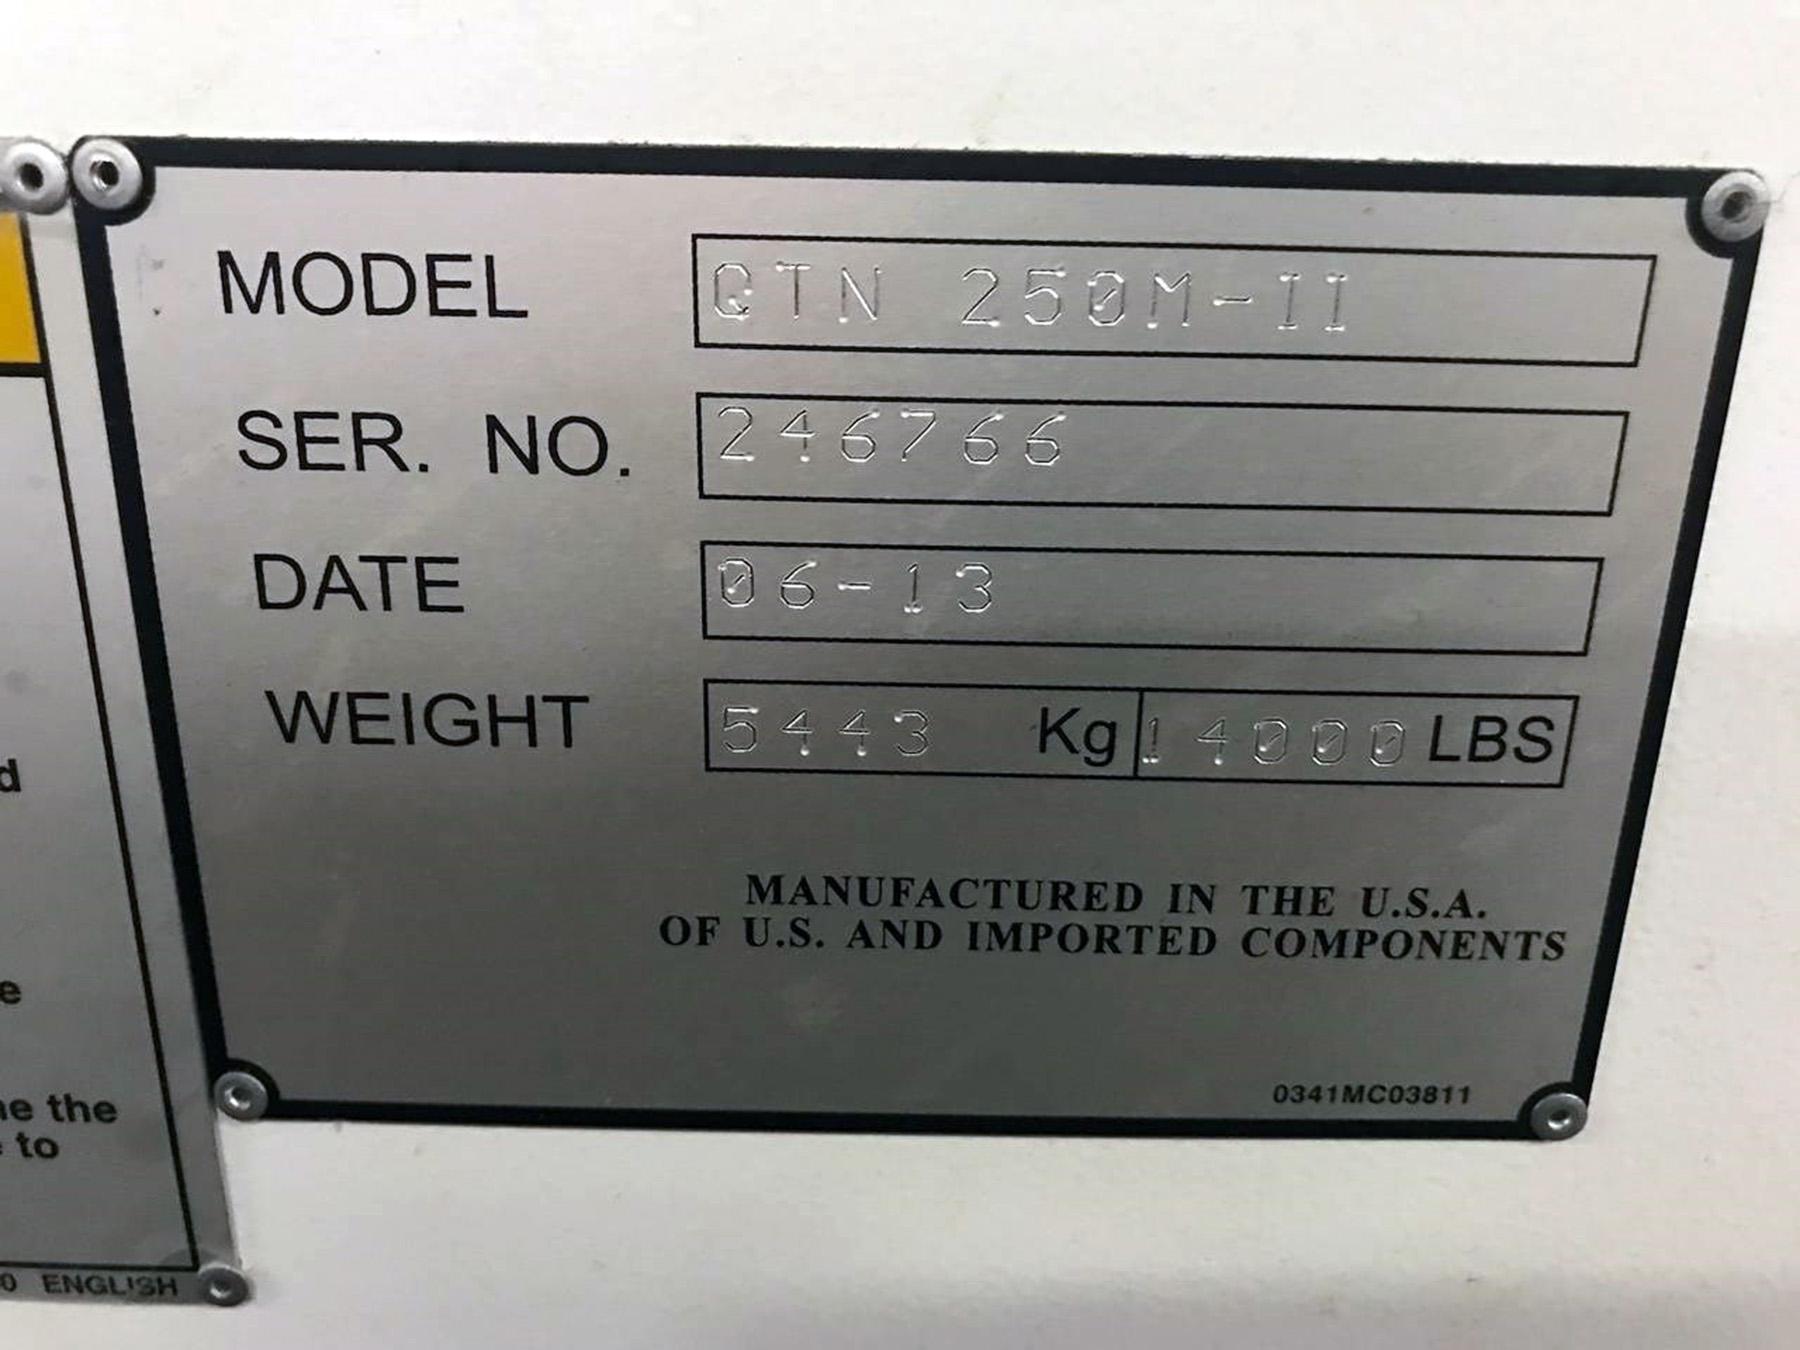 USED, MAZAK QTN 250M-II CNC TURNING CENTER WITH MILLING